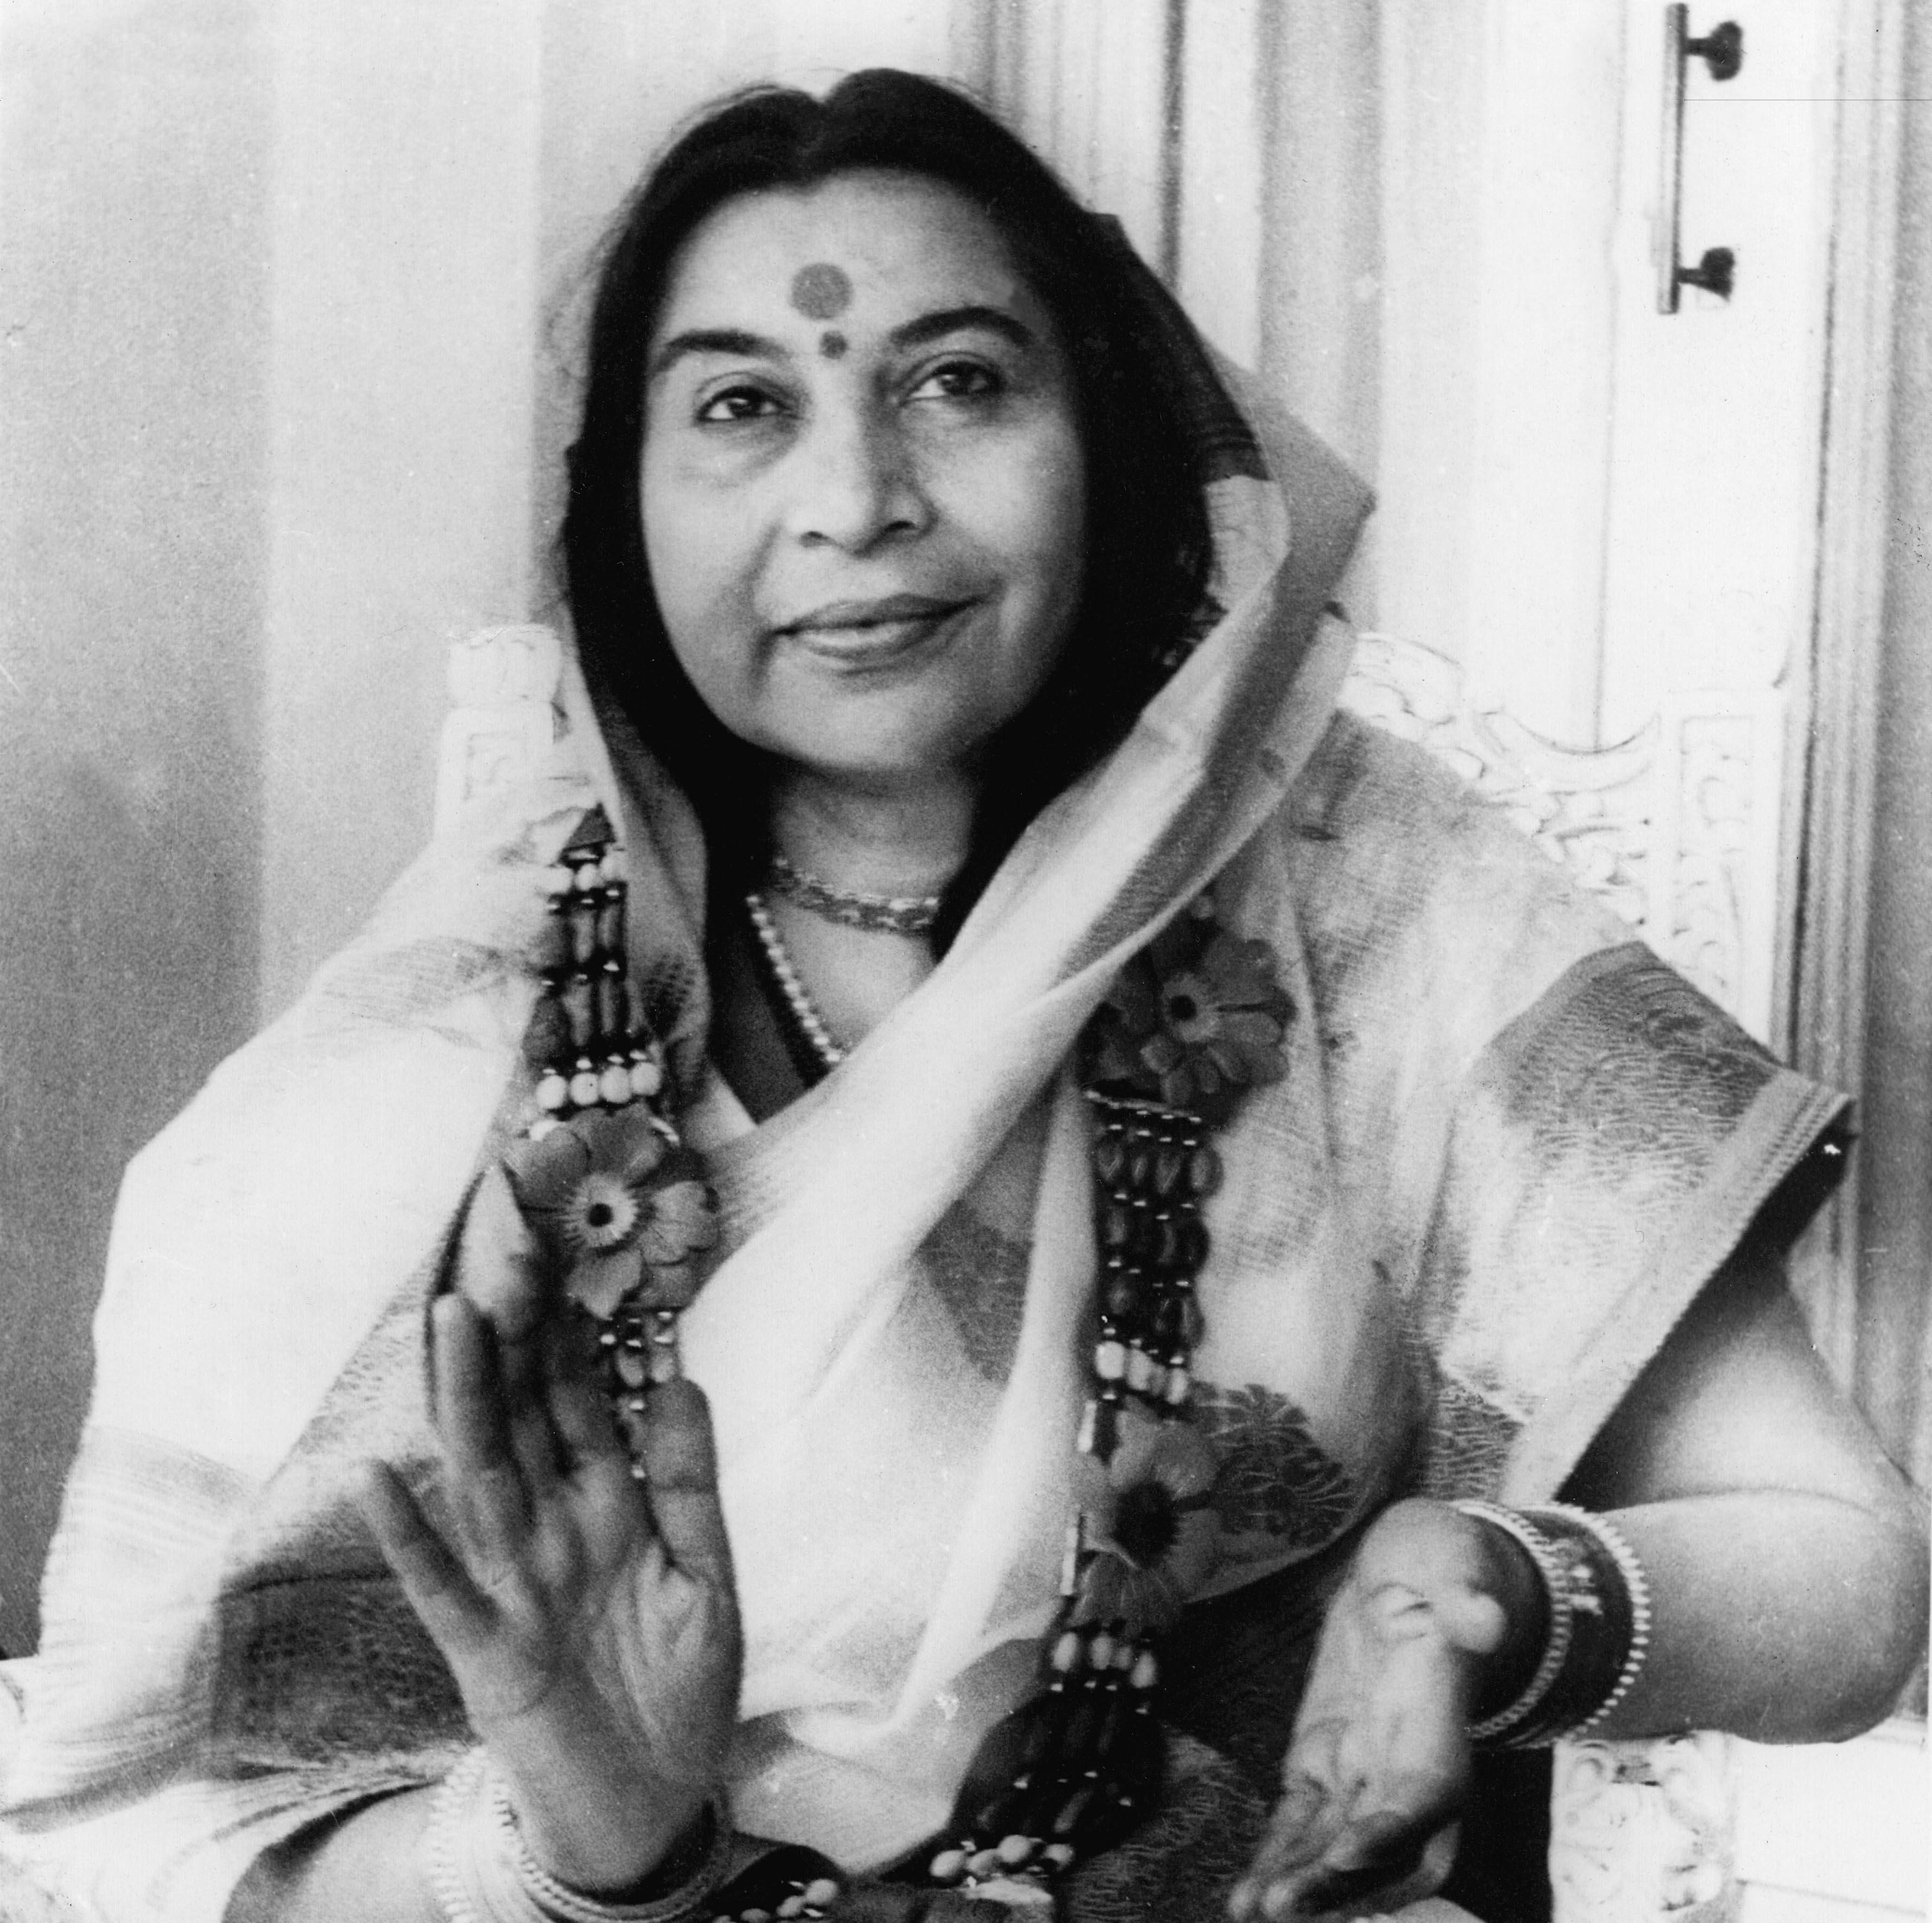 Shri Mataji Guru / Teacher - Become Your Own Guru